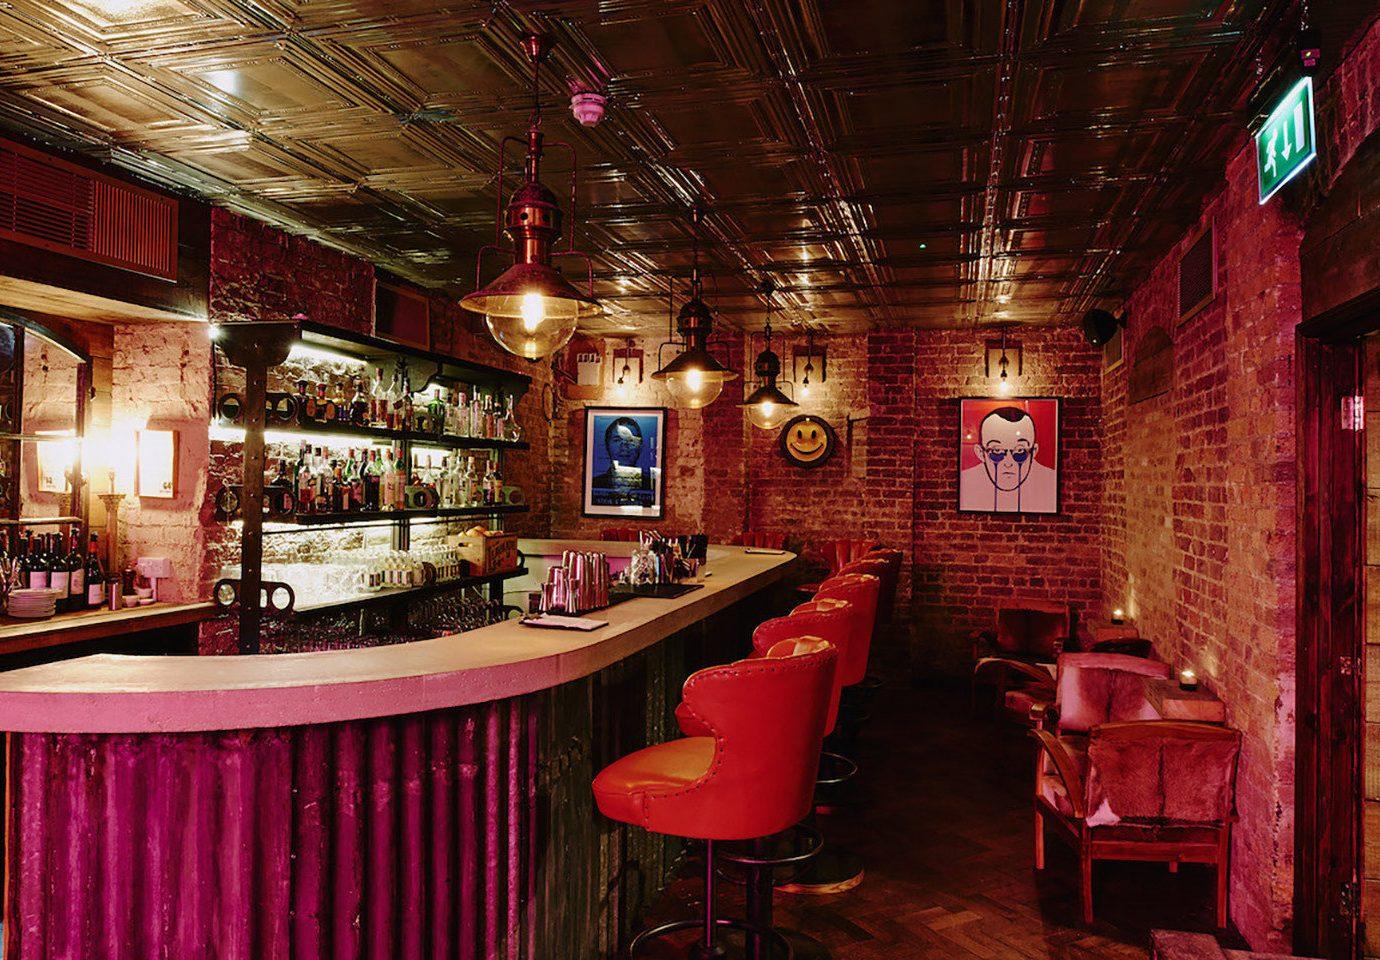 Boutique Hotels Hotels indoor red ceiling chair Bar restaurant interior design pub tavern café furniture